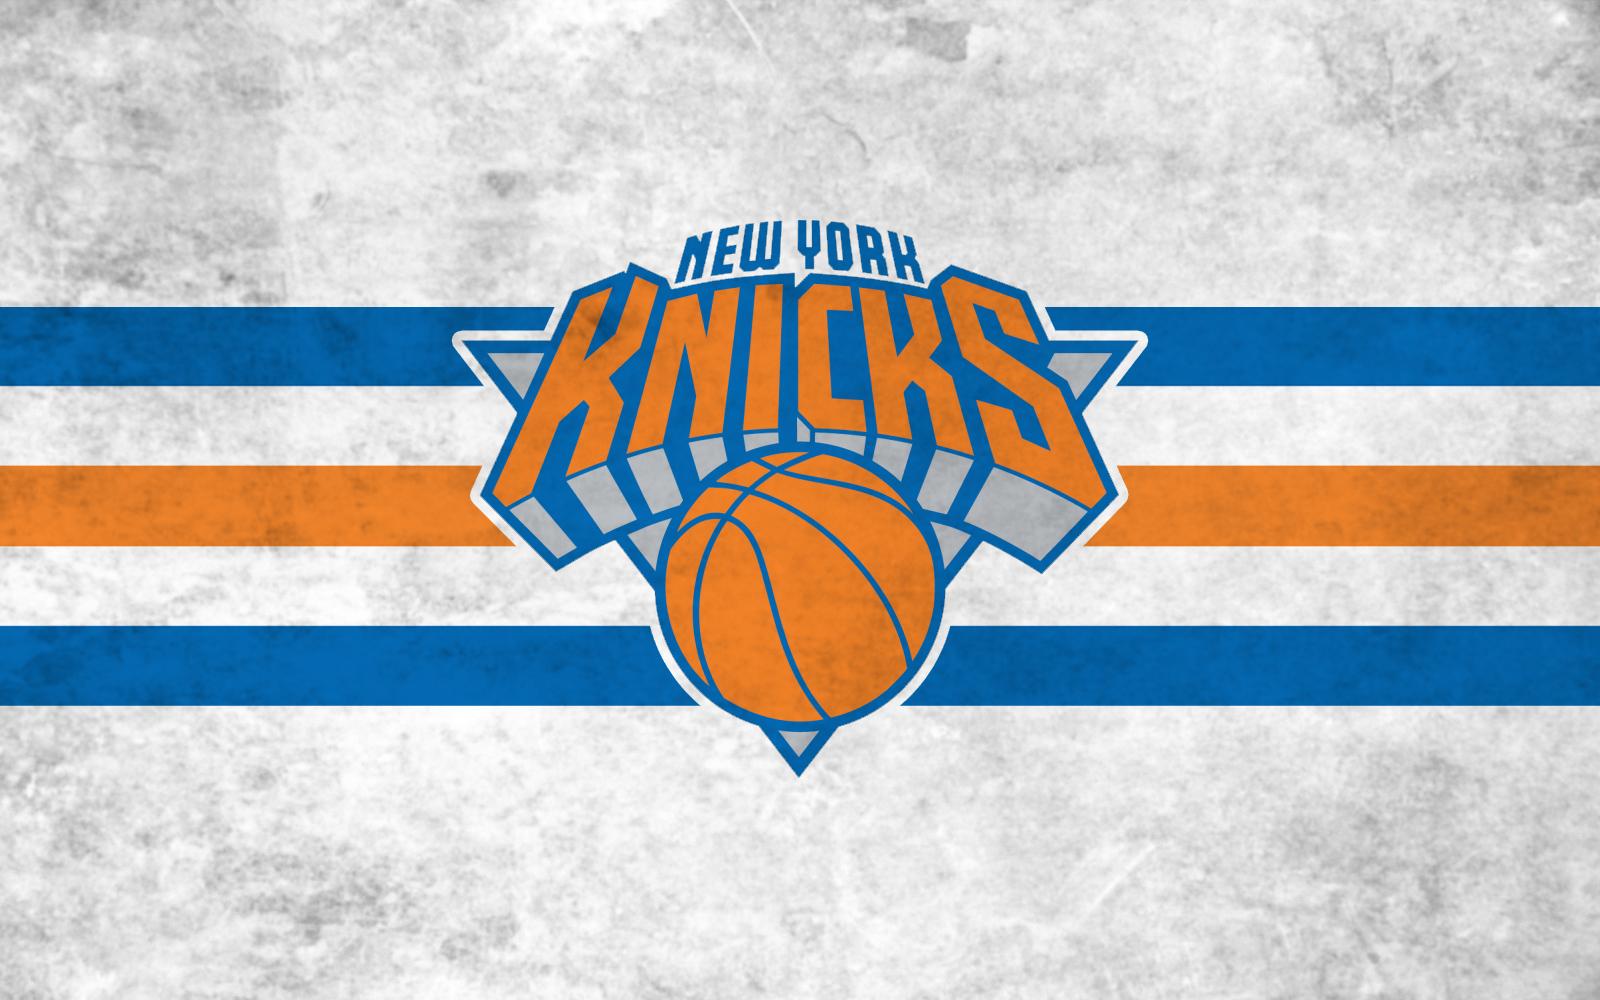 Nba Basketball New York Knicks: Knicks HD Wallpaper